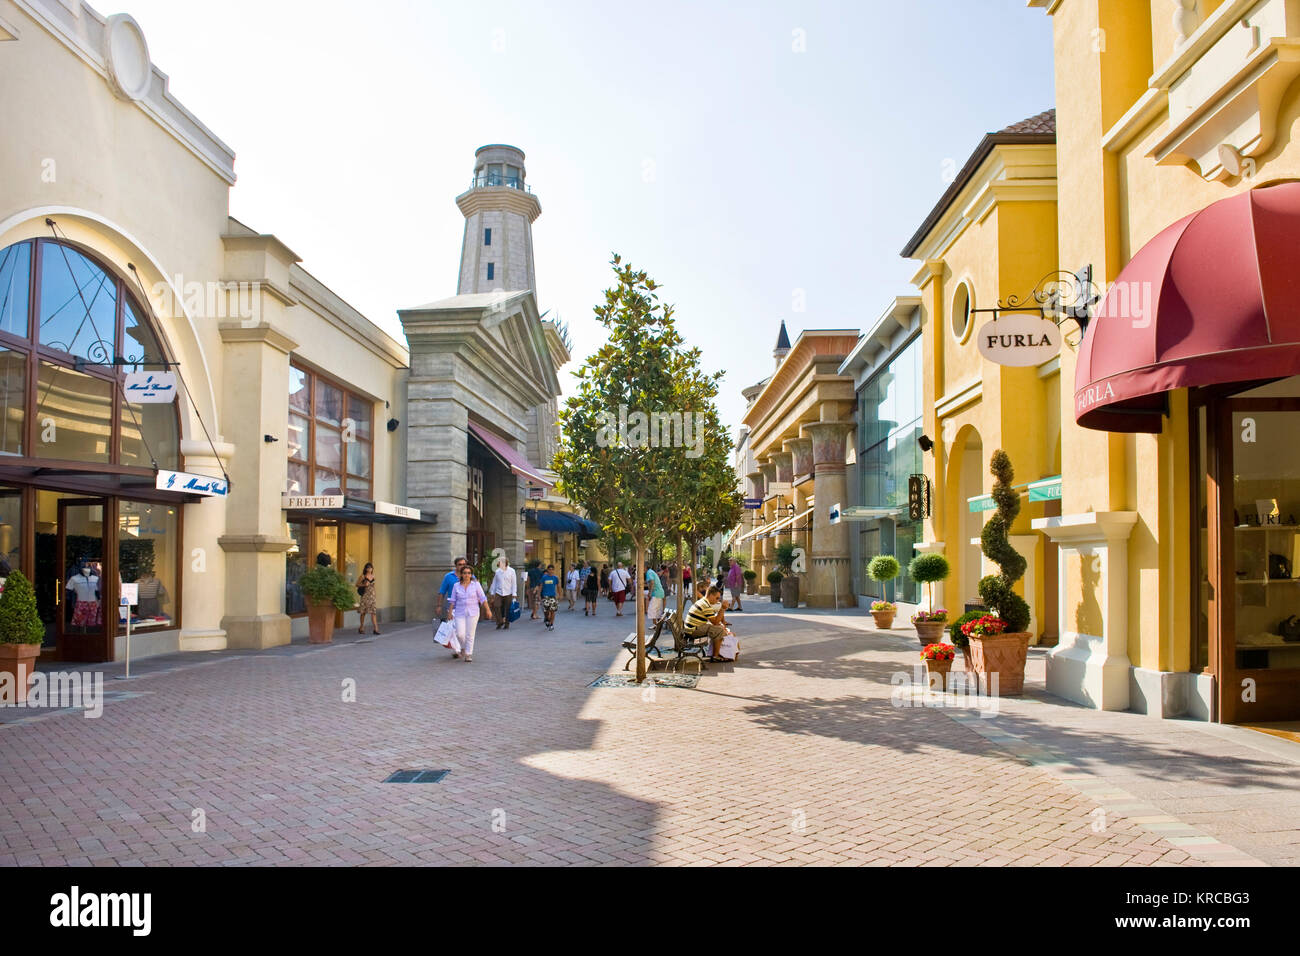 Shopping center Fidenza village, Fidenza, province of Parma, Italy - Stock Image